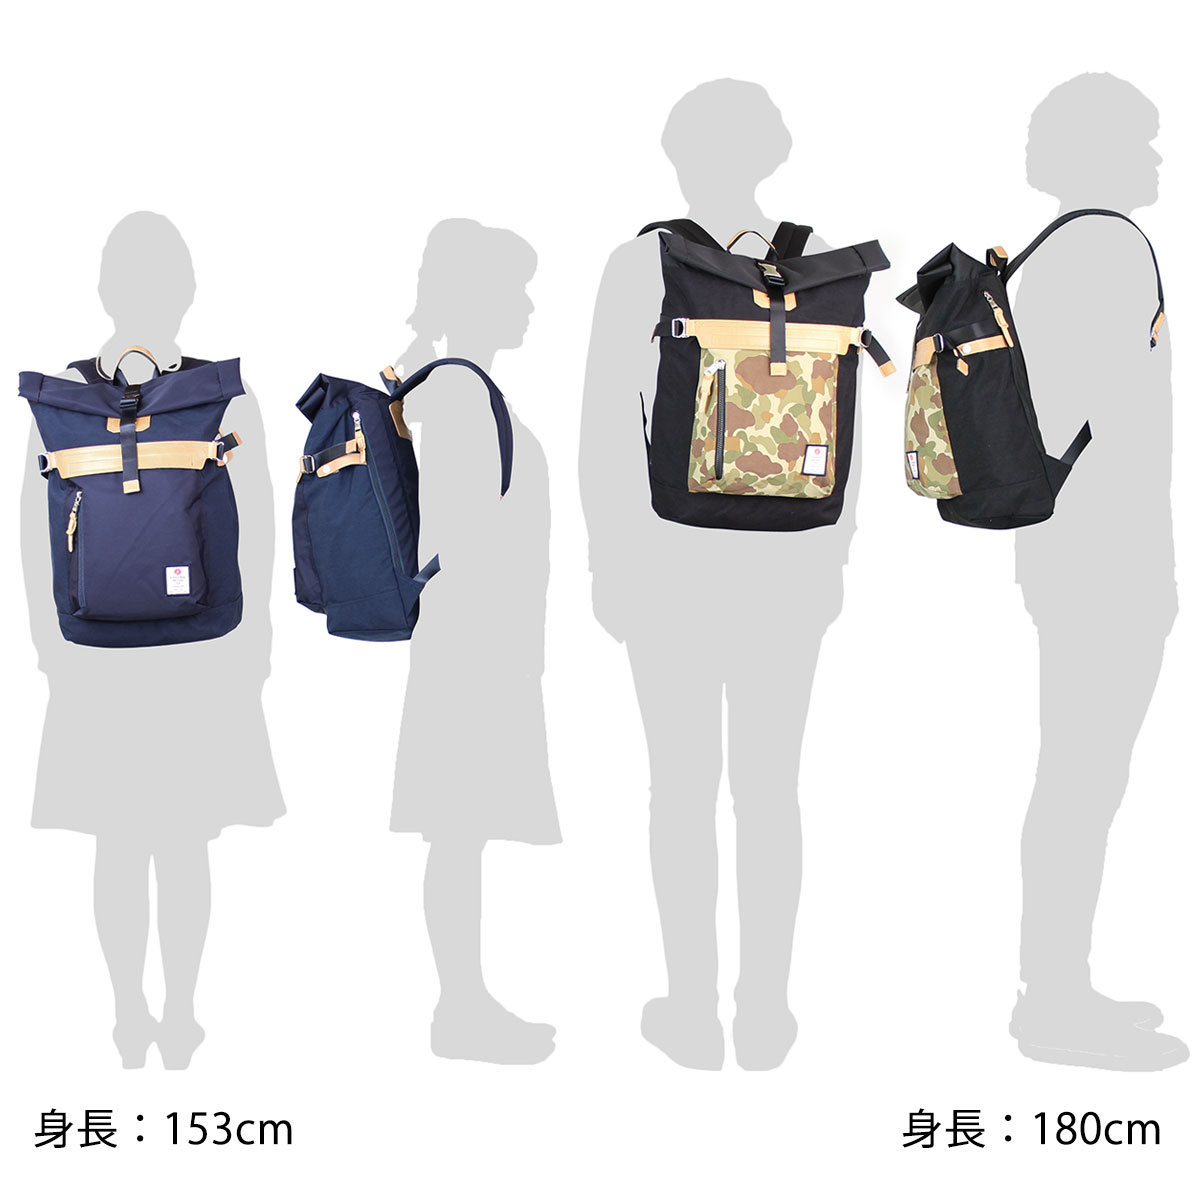 AS2OV backpack rucksack HI DENSITY CORDURA NYLON men gap ASSOV 091400